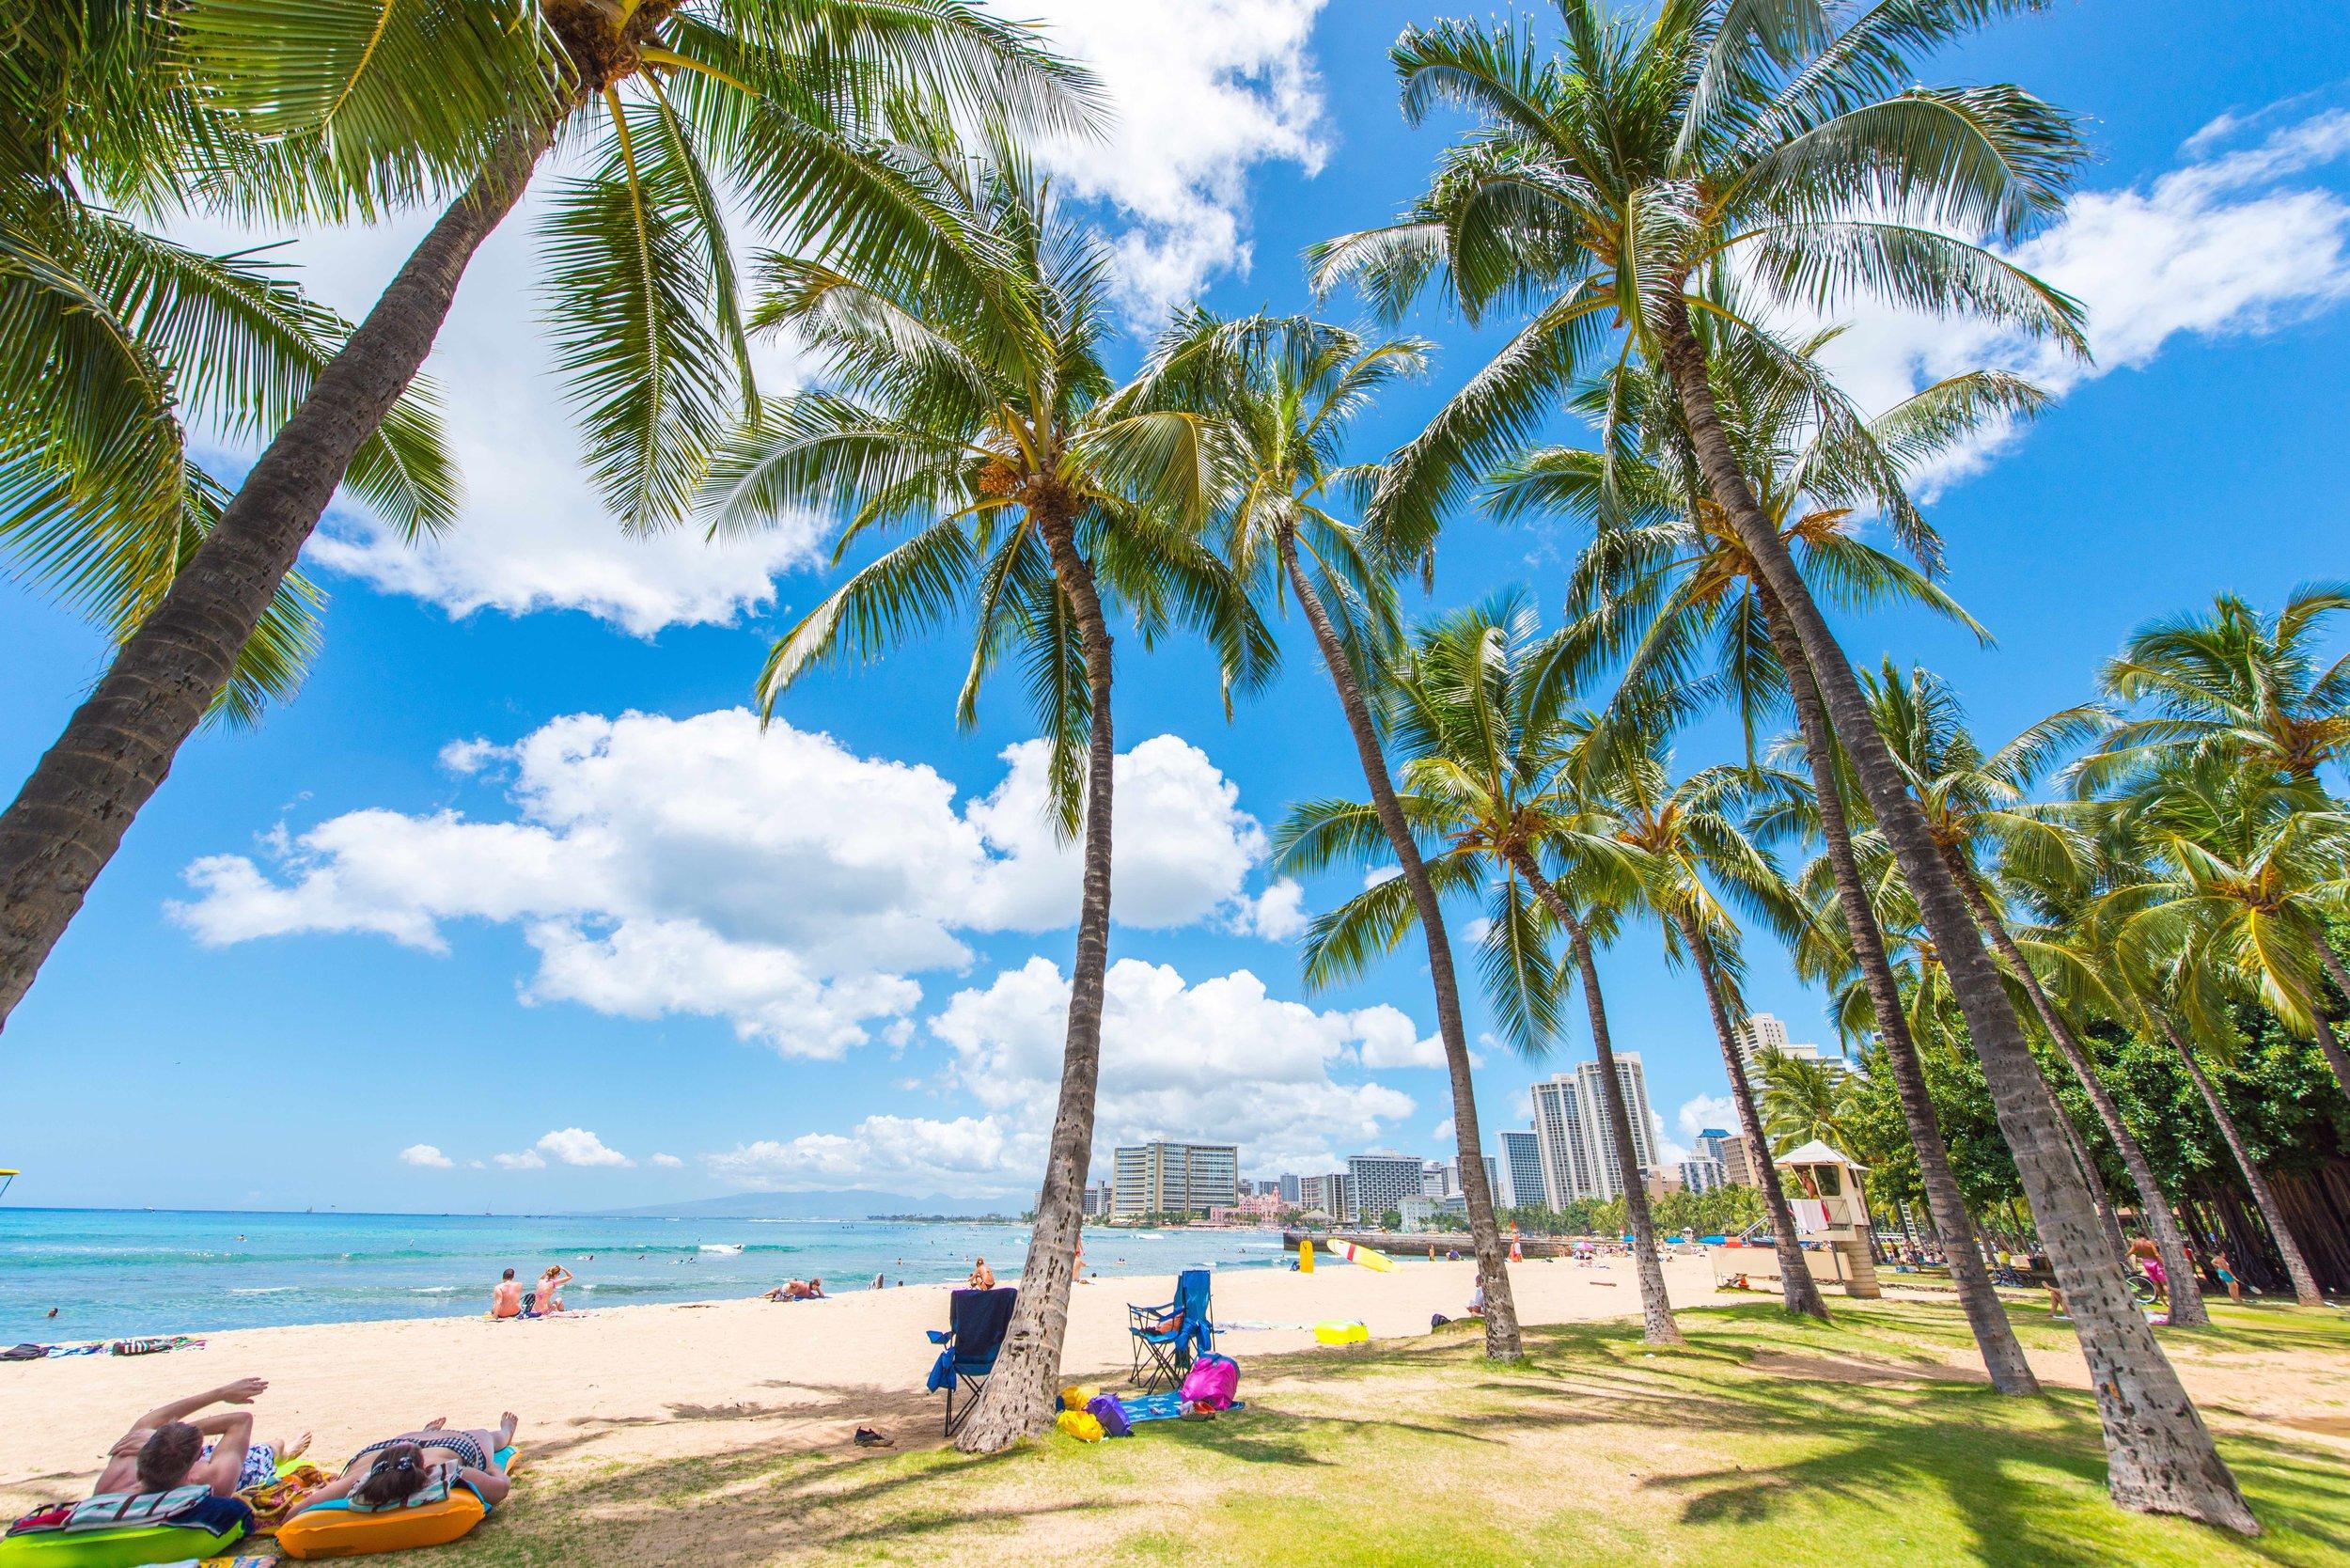 Hawaii beach.jpg